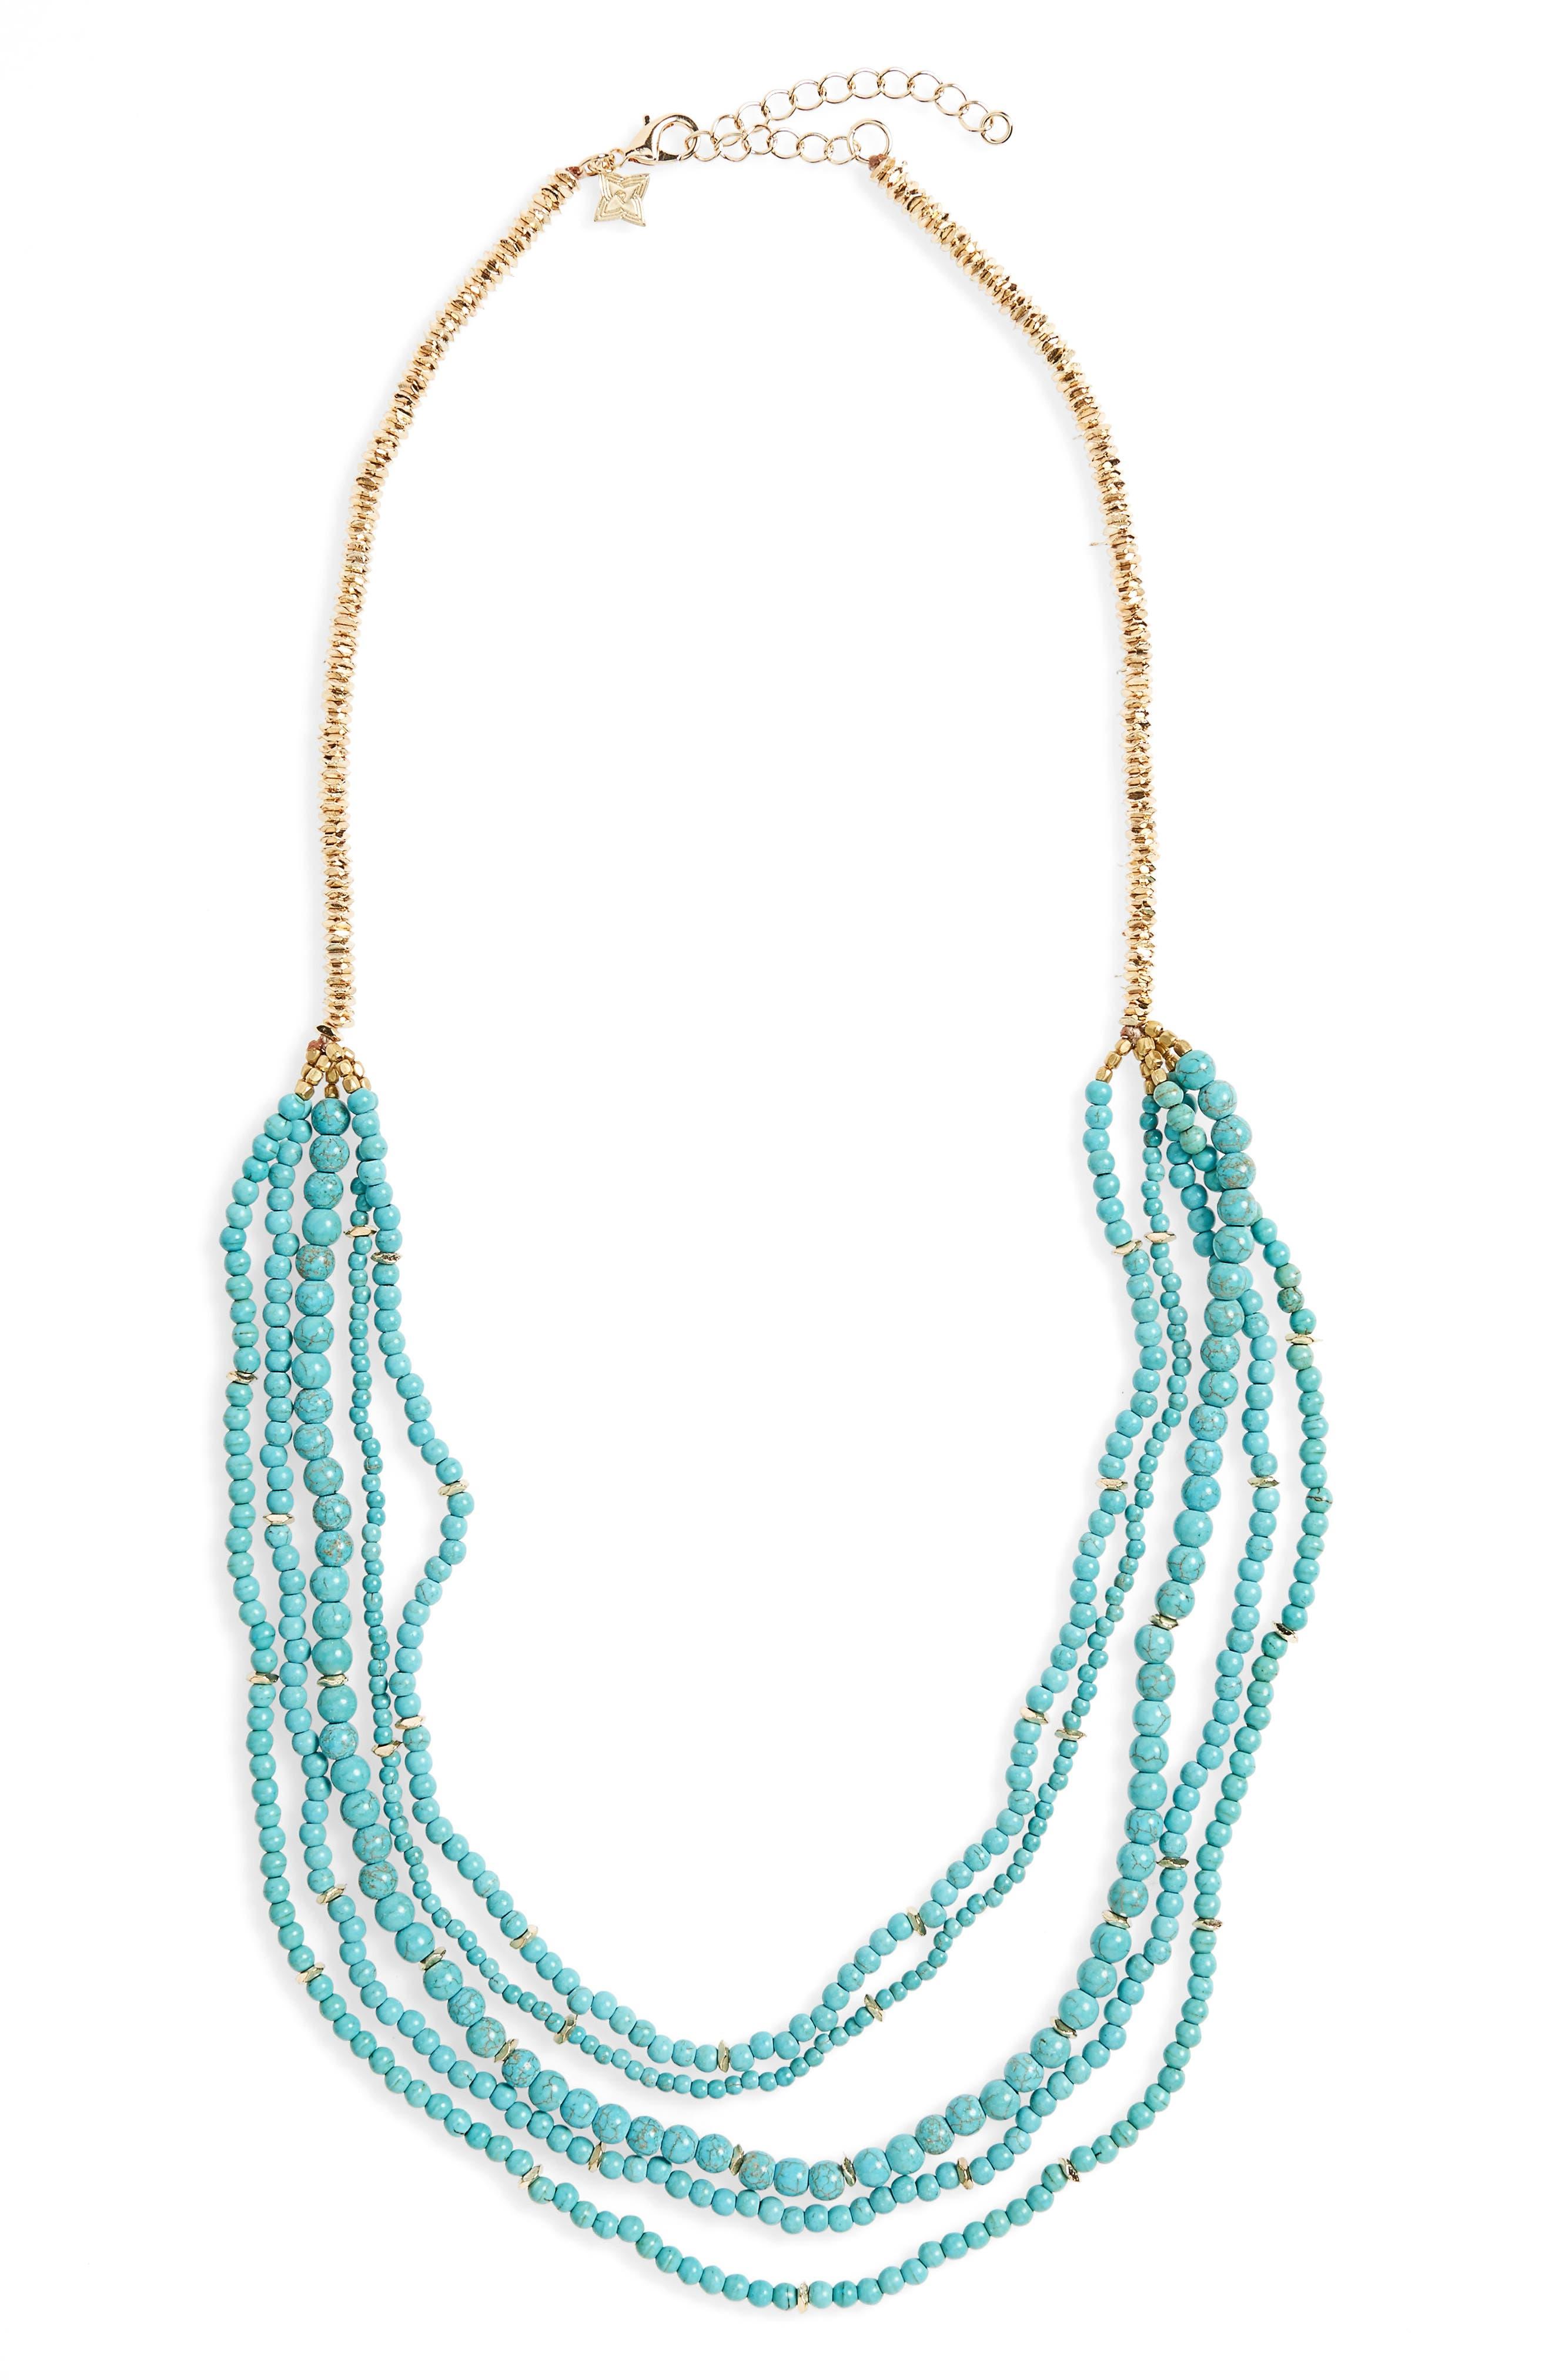 Main Image - Panacea Howlite & Quartz Multistrand Necklace